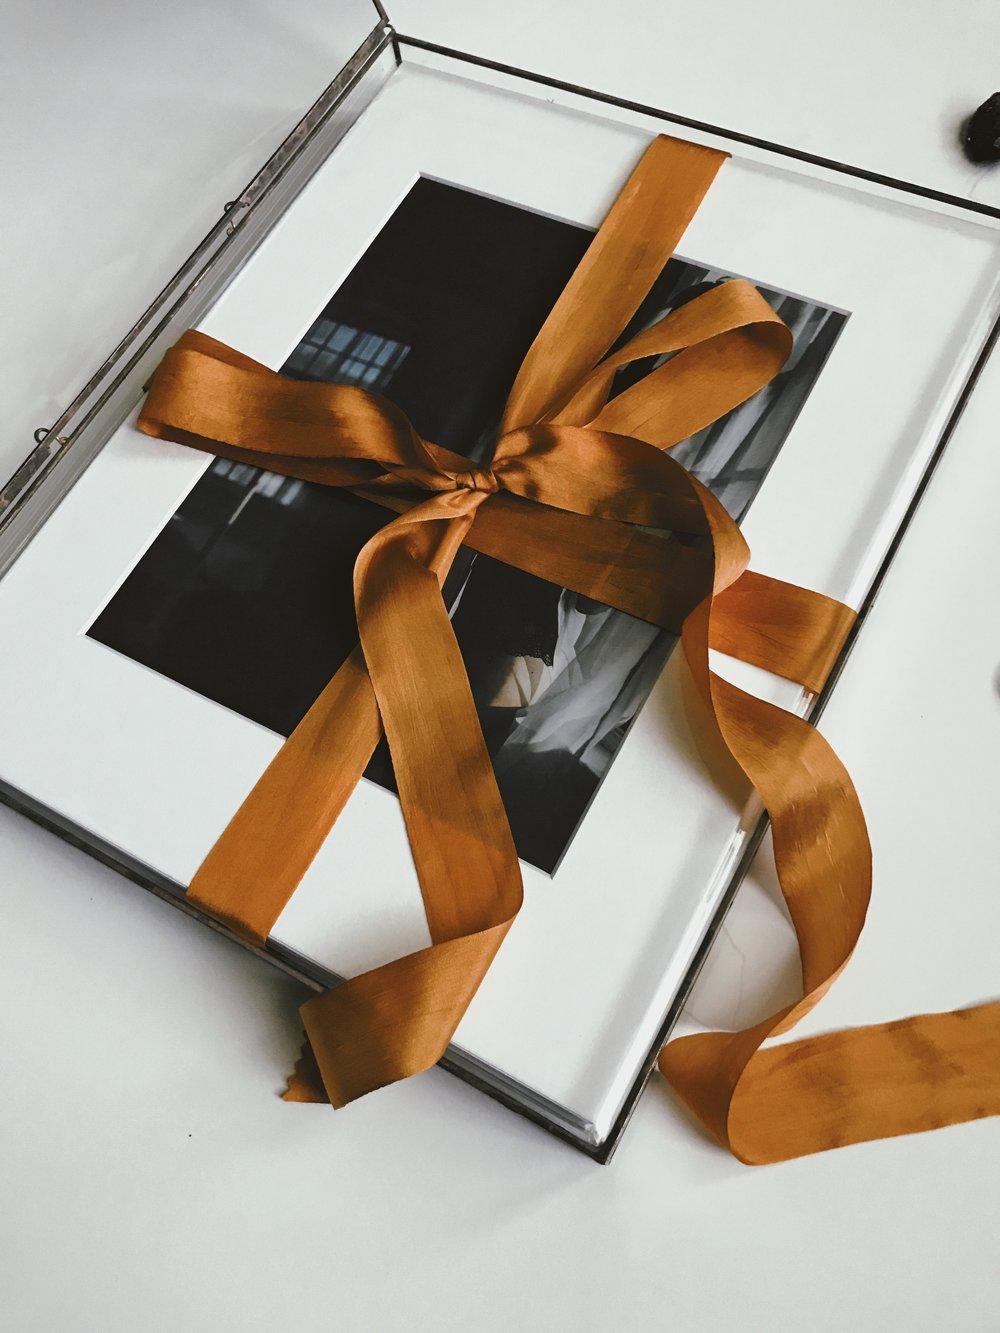 copperandsagecollective-grand-rapids-photographer-fine-art-prints-in-keepsake-box